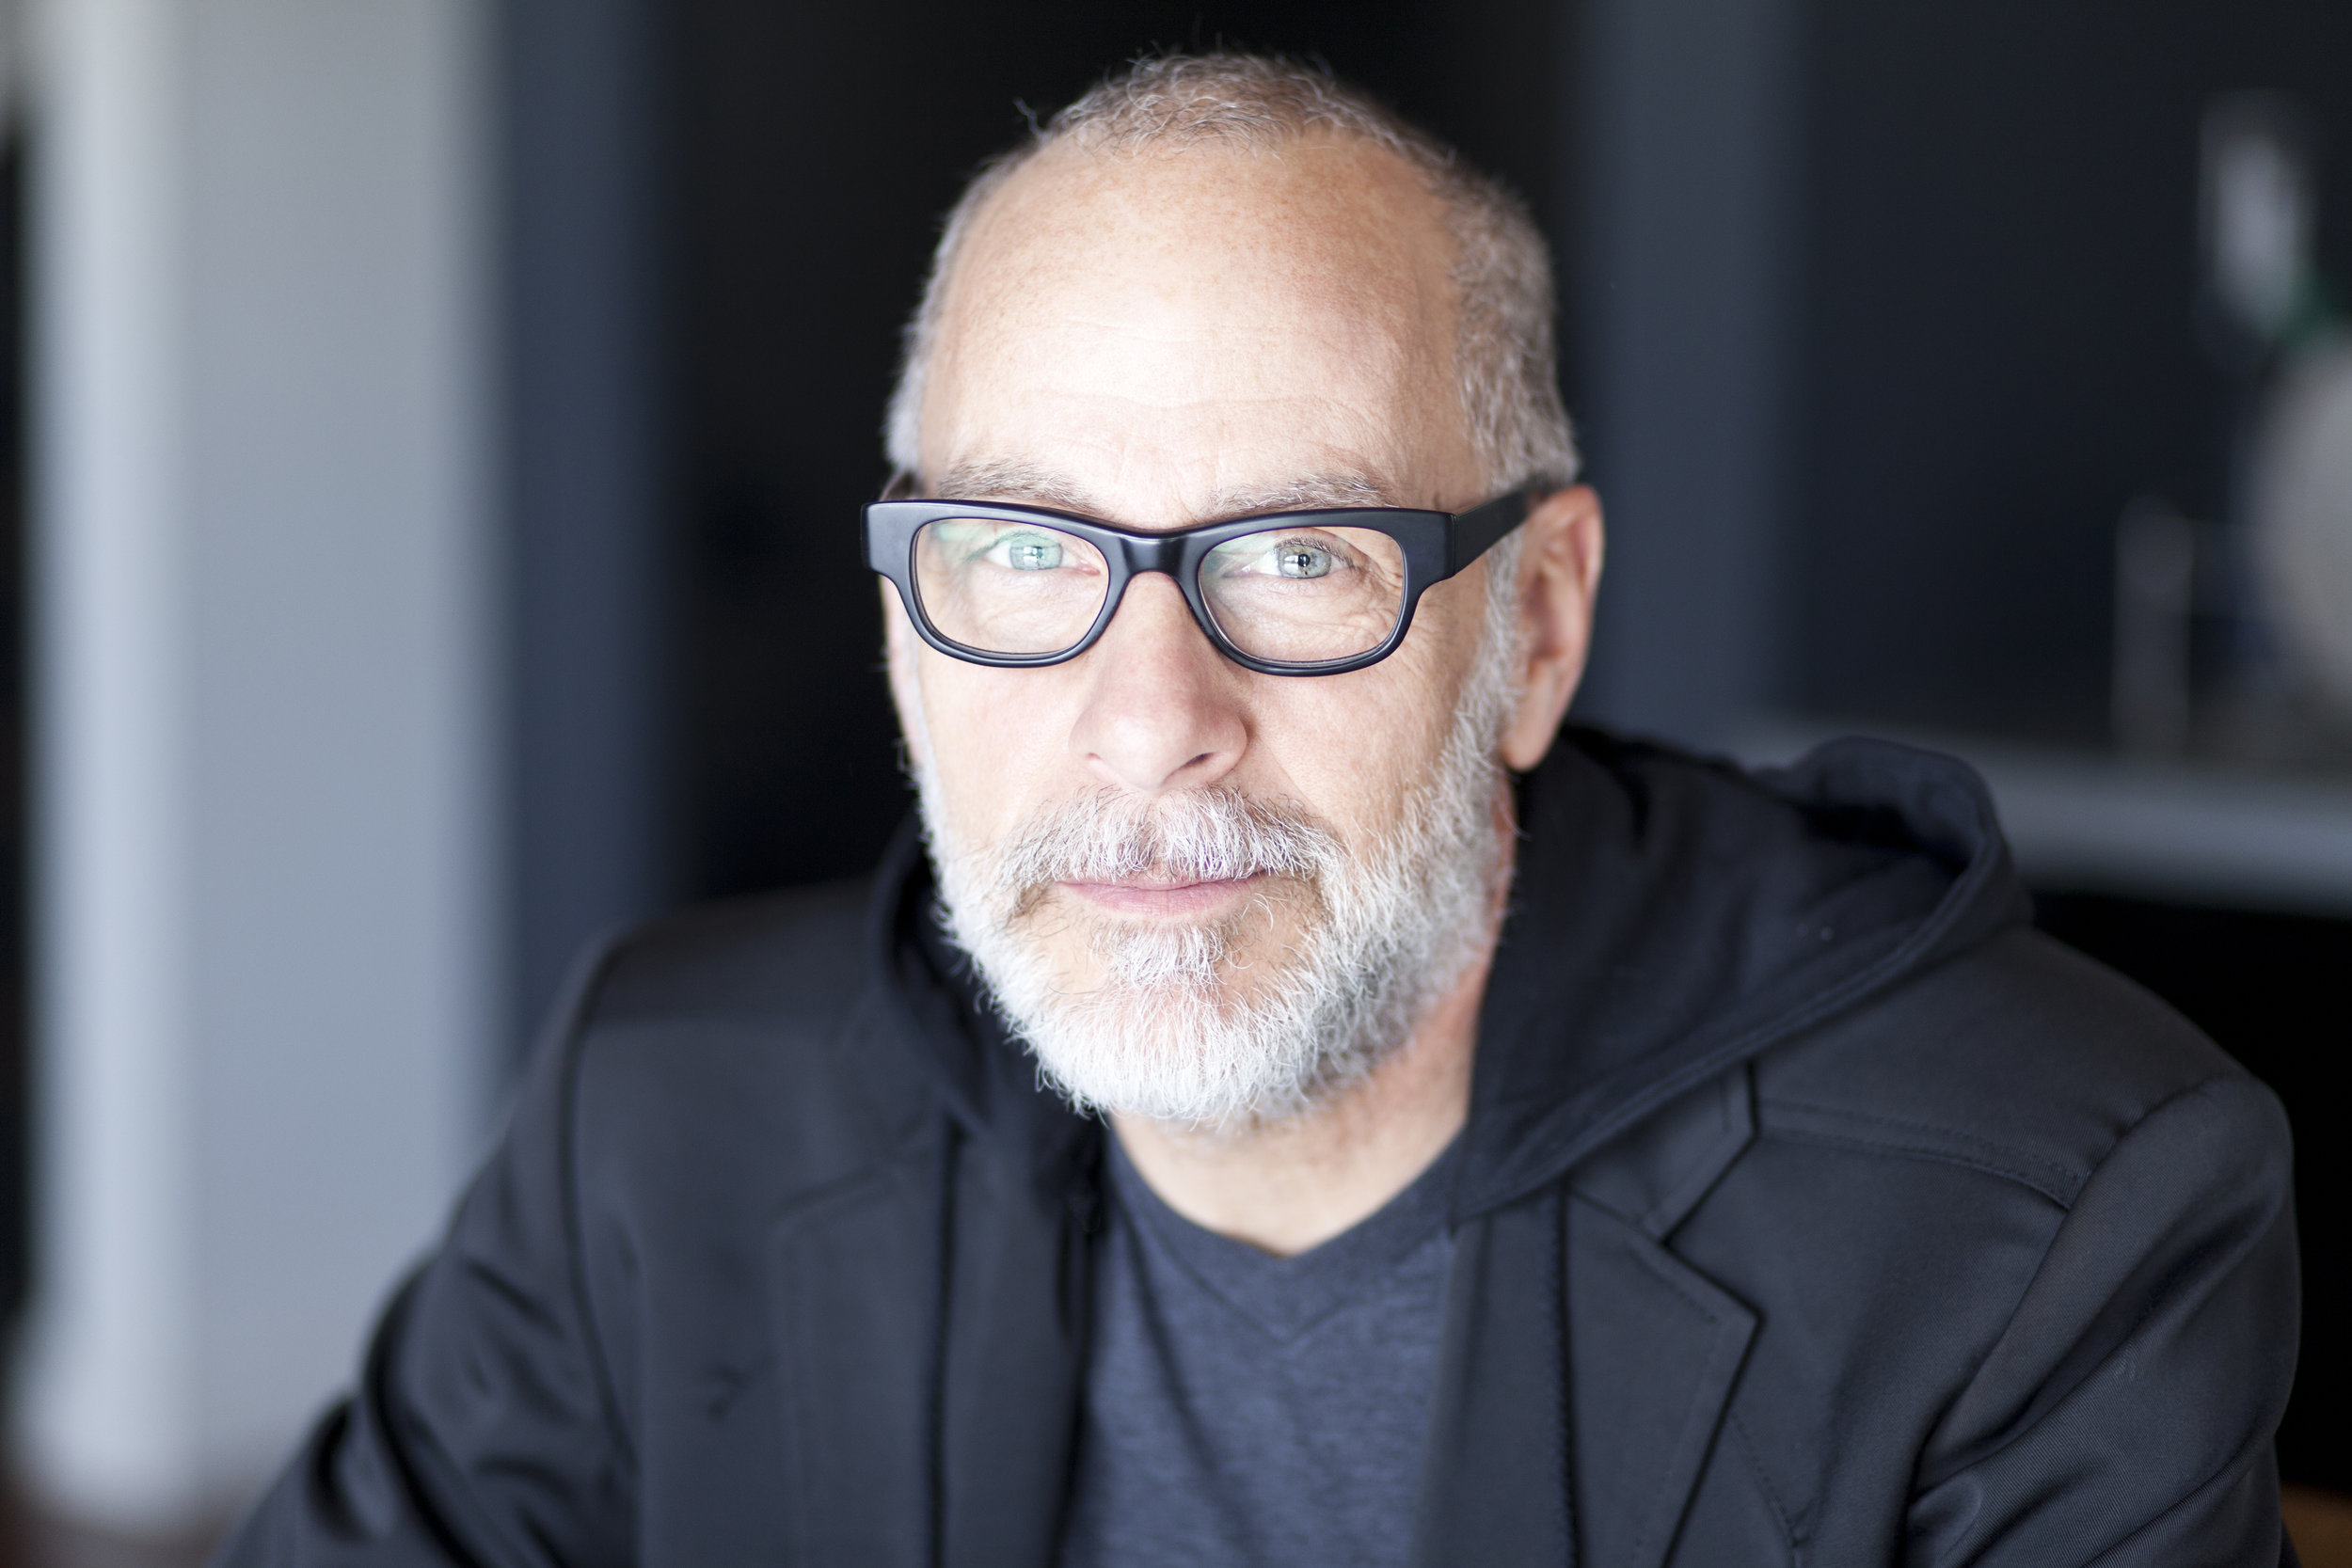 man with glasses.jpg